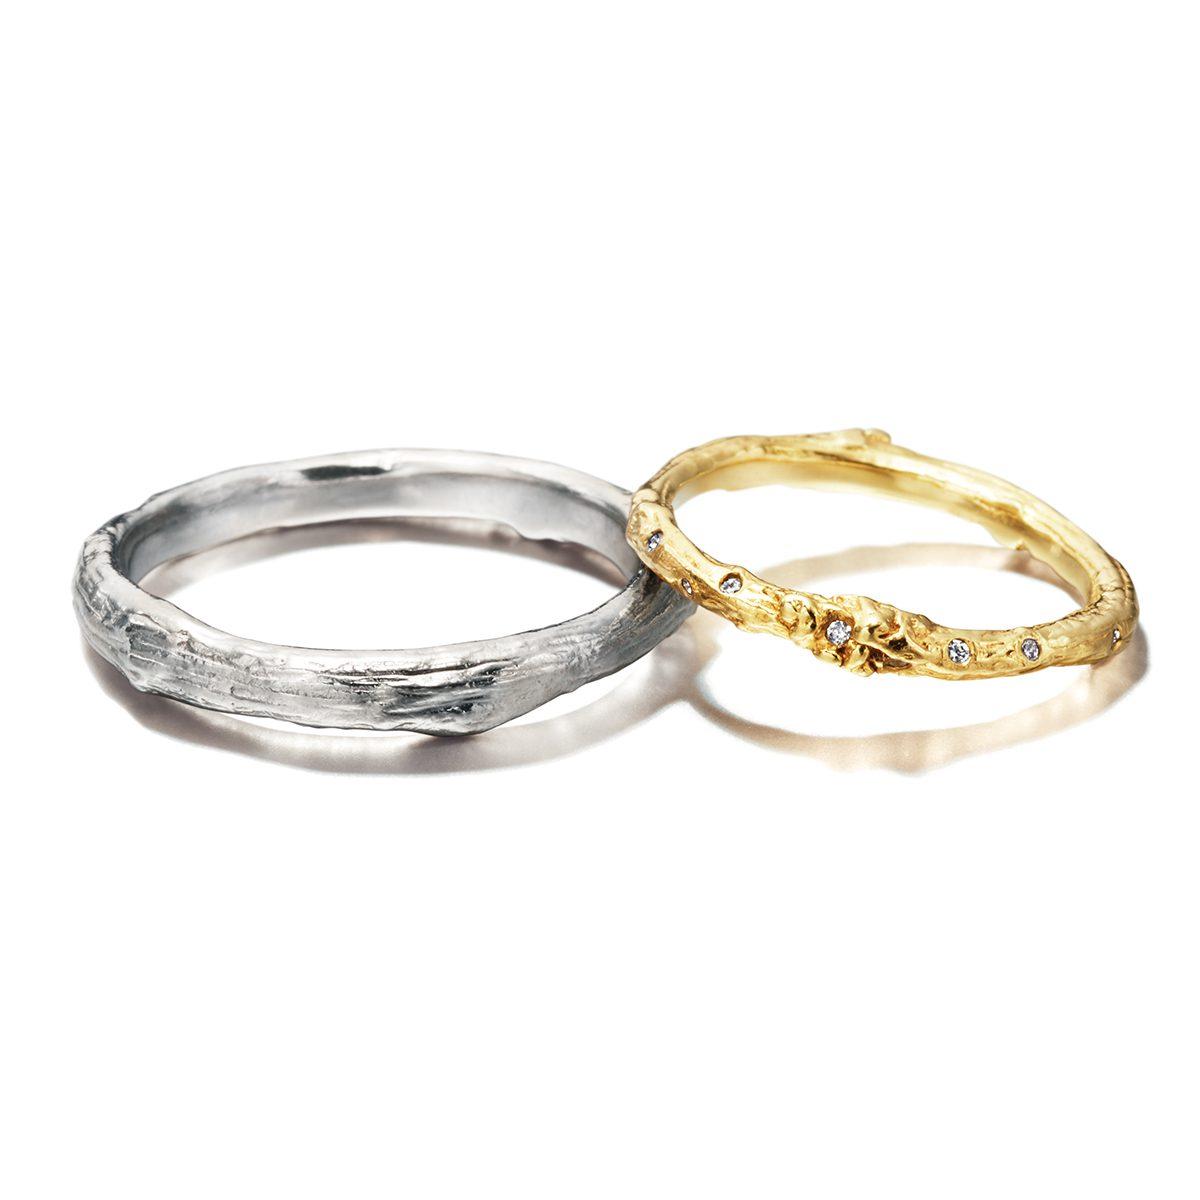 ALEX MONROE - Branch  Marriage Rings